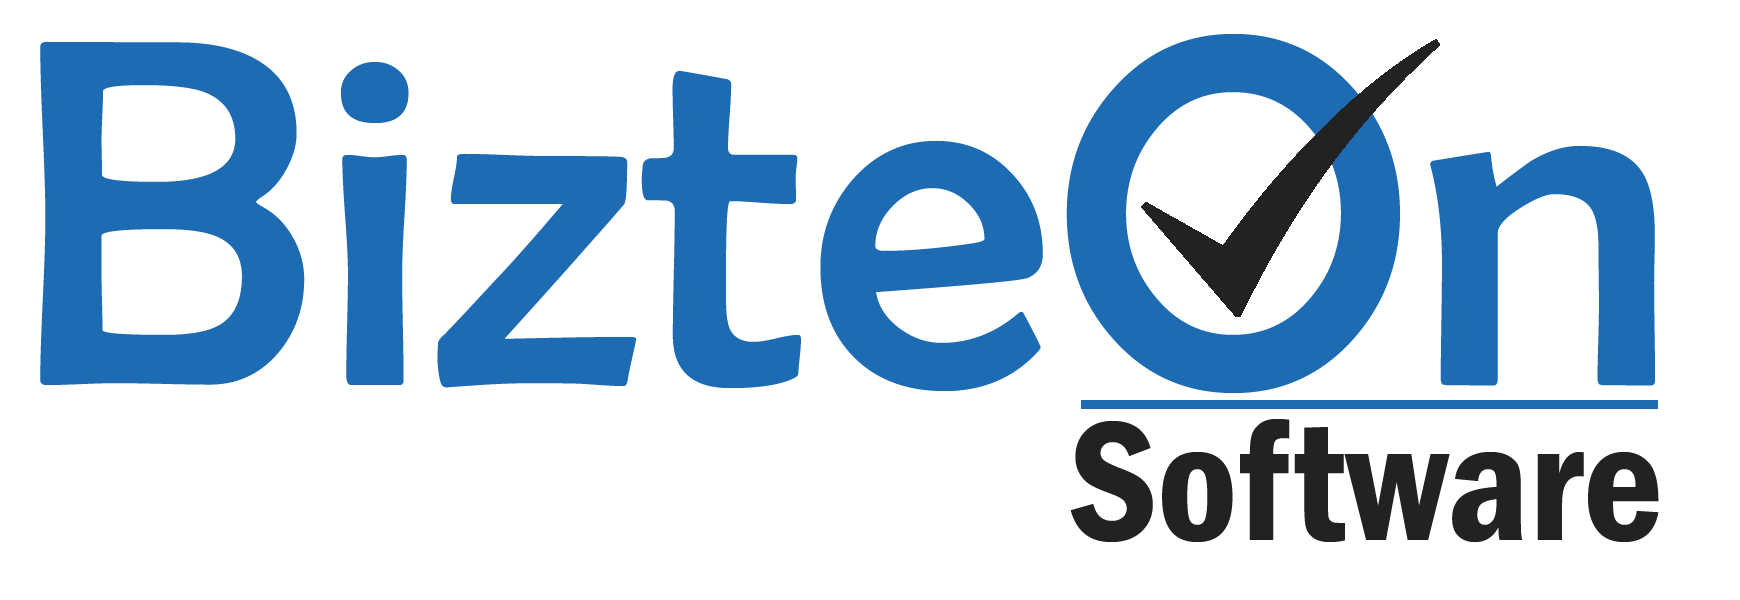 Bizteon Software Logo